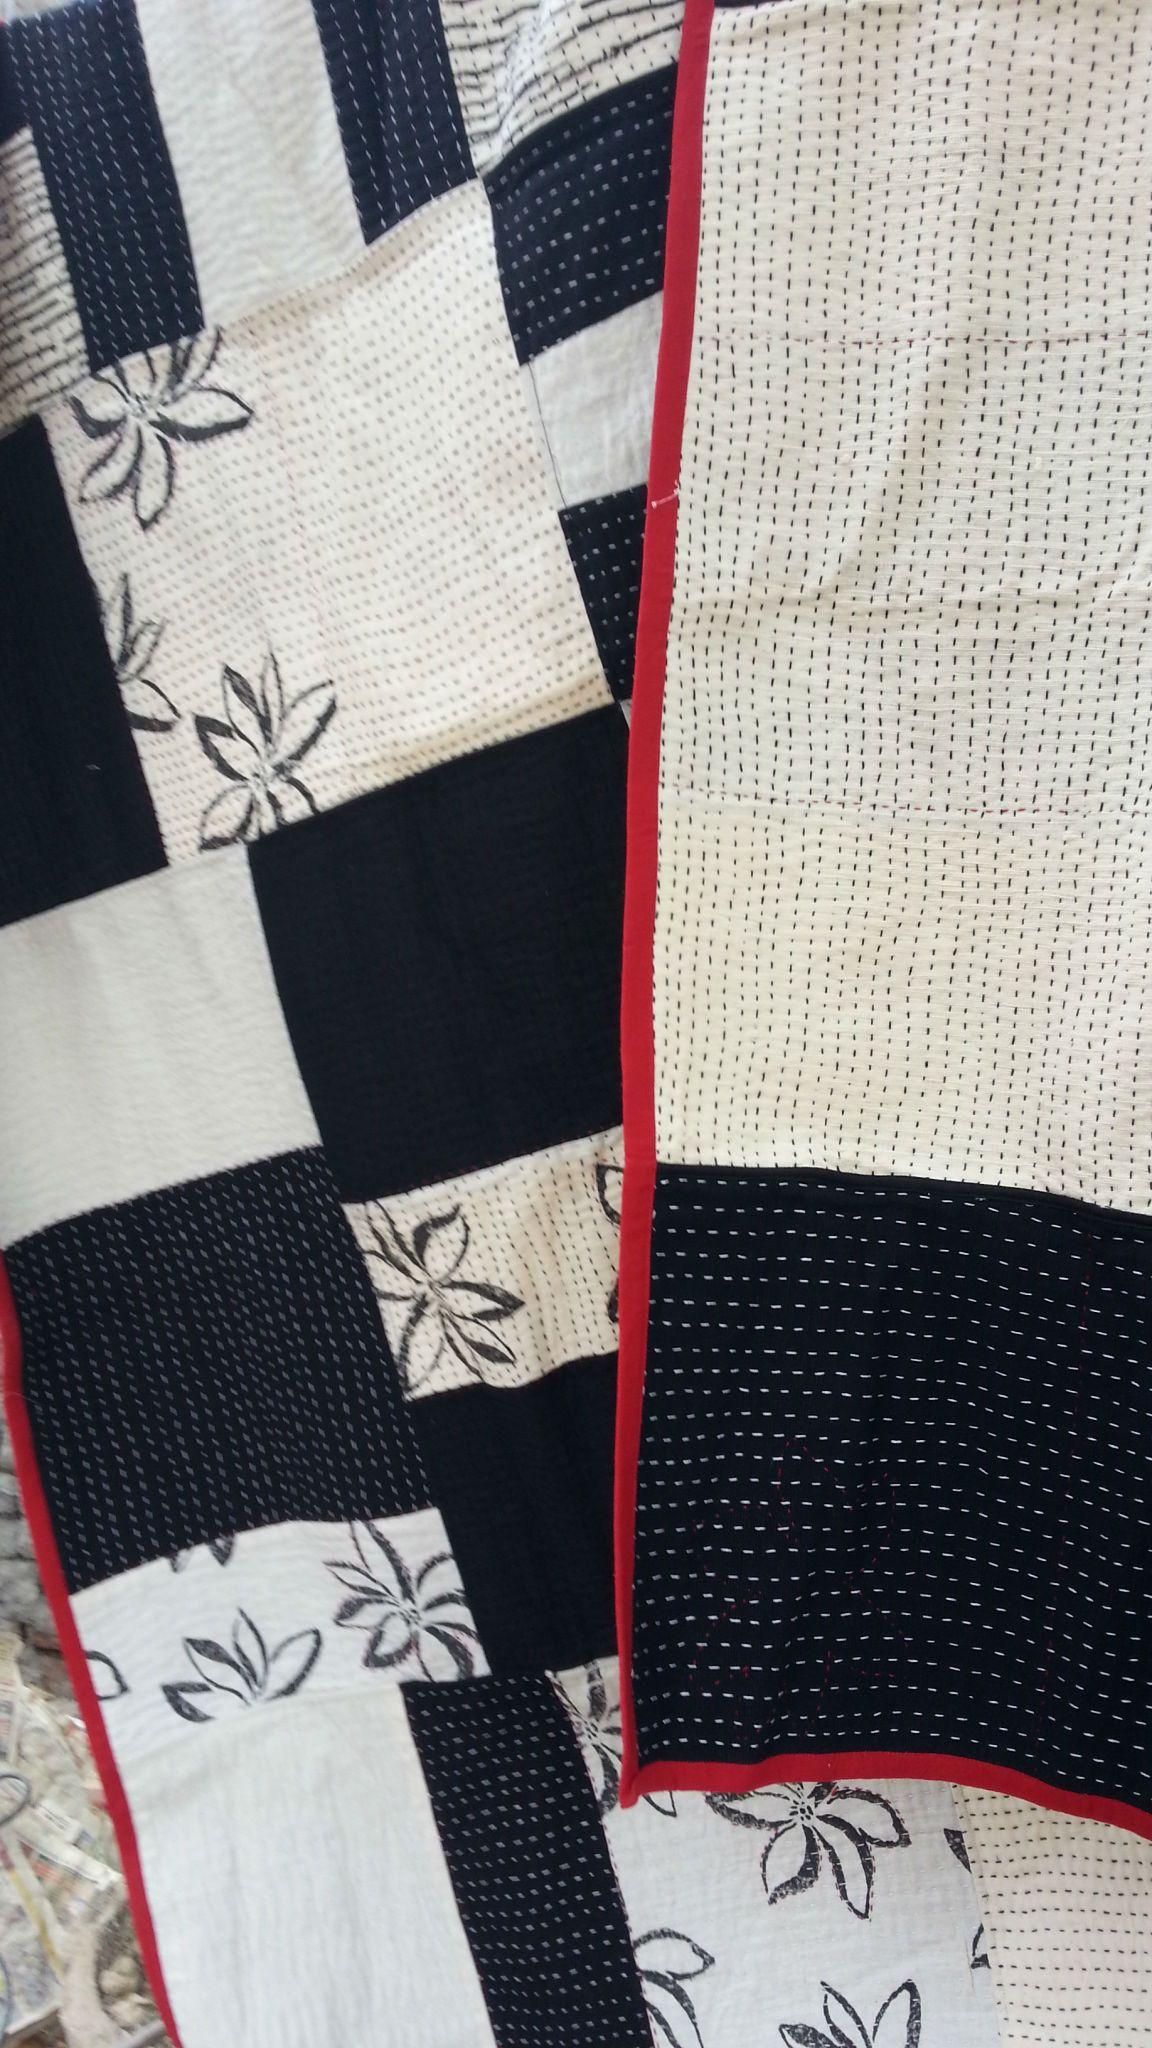 1.7.14- Quilt 21/7. Lotus Patched Quilt.  Handloom khadi cotton by Gaffer, Block print by Mrs Nandu, Hand stitch by Mrs Jesu, Suman and Manju, Machine by Shaquil